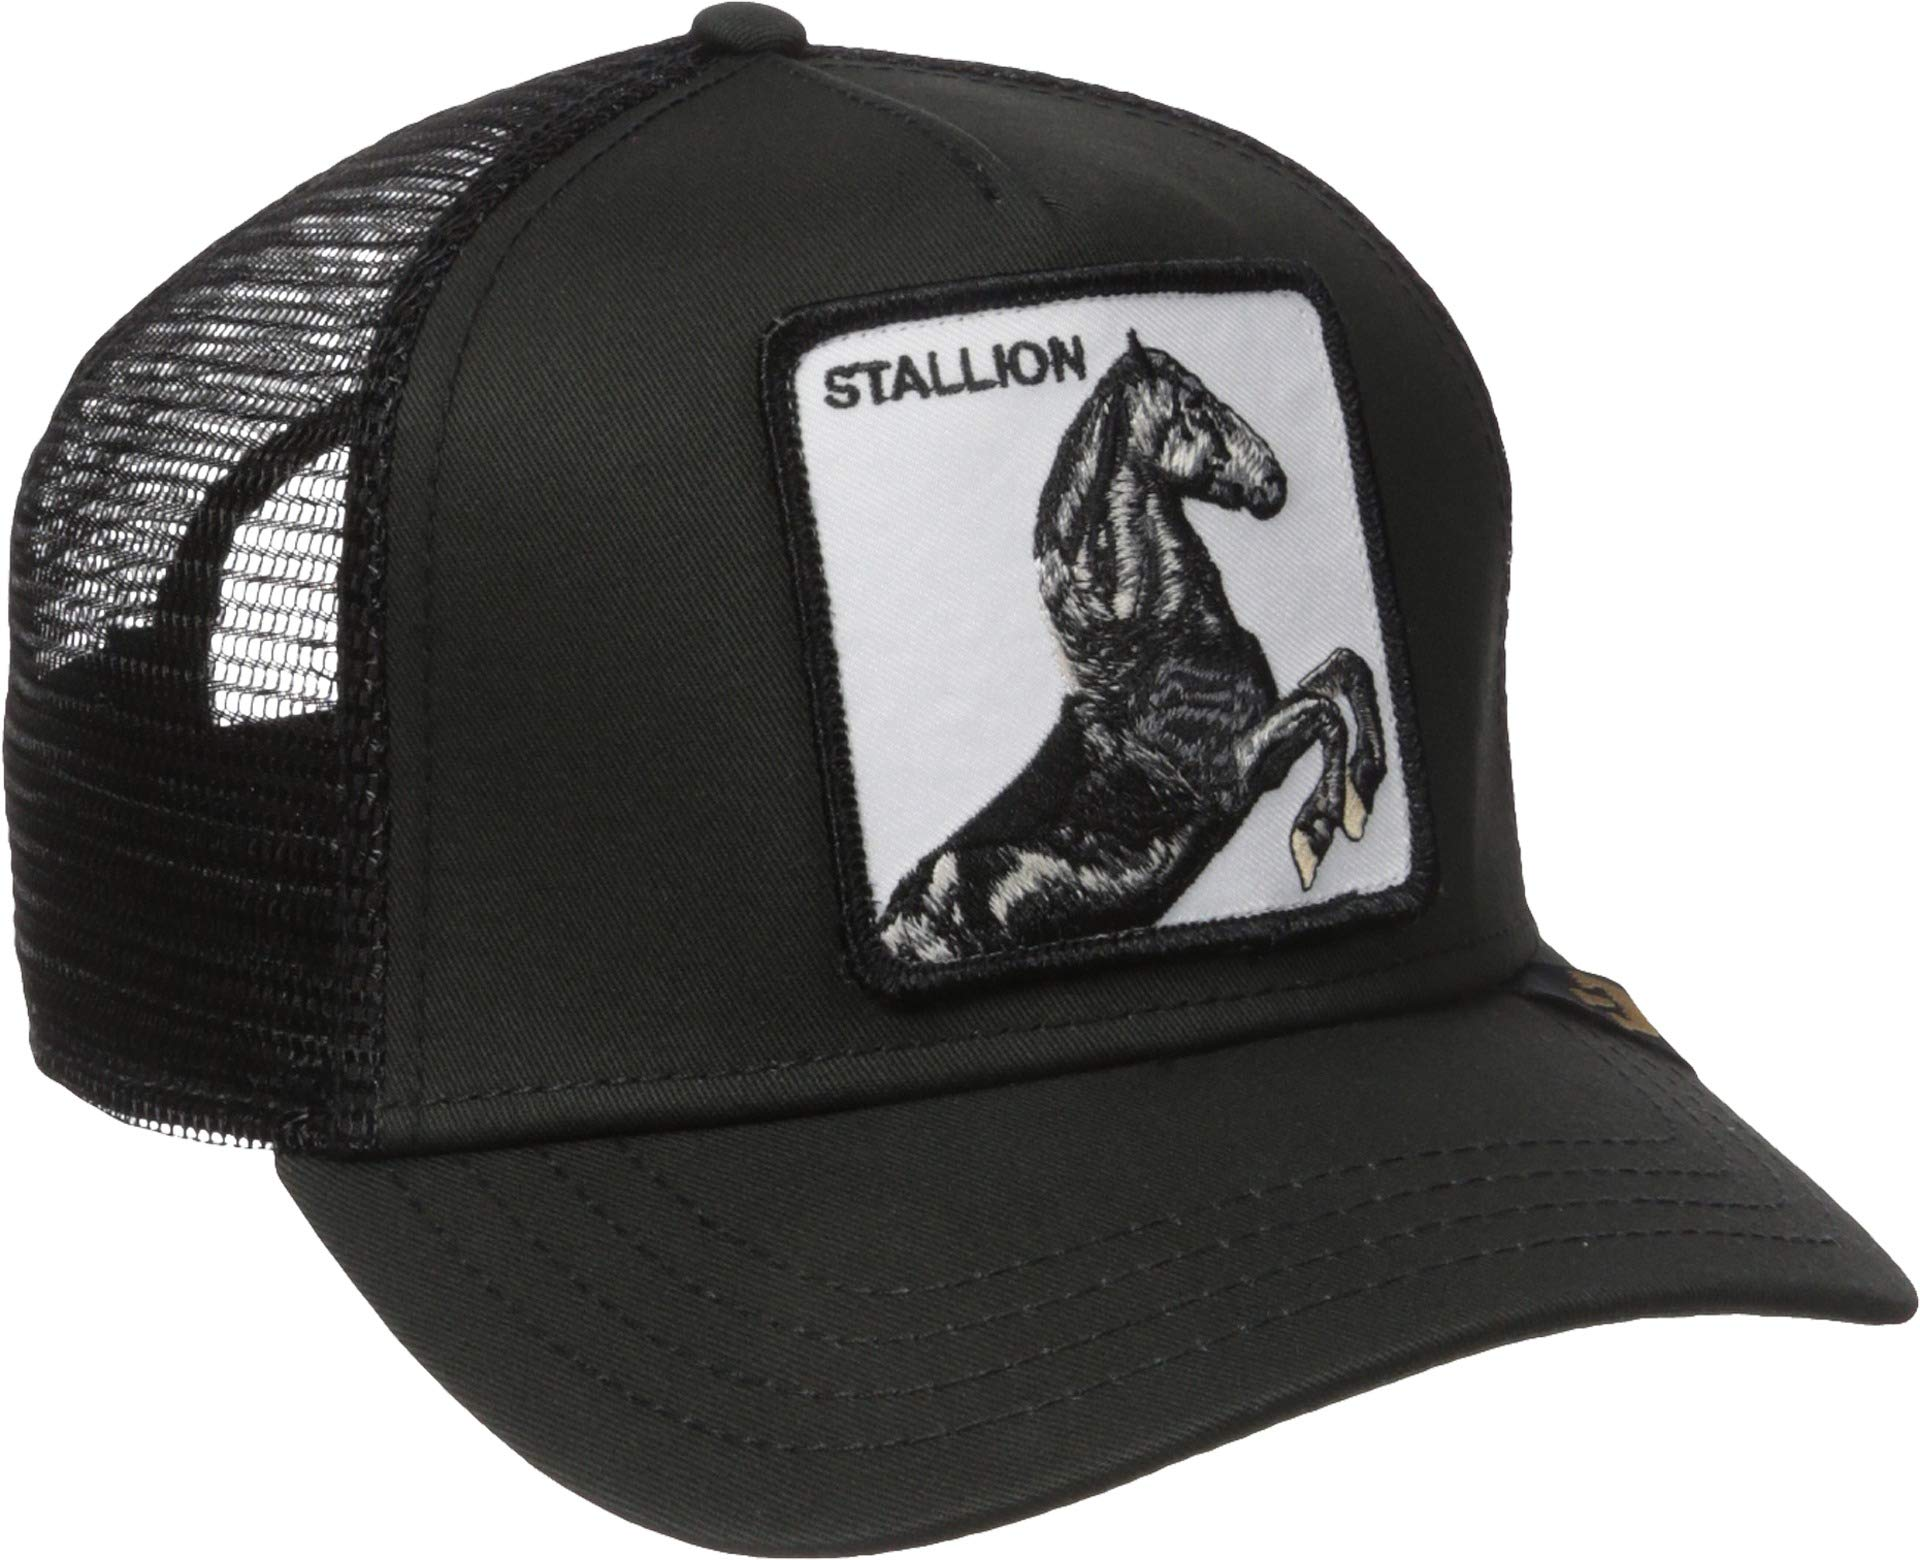 Goorin Bros. Men's Animal Farm Snap Back Trucker Hat, Black Horse, One Size